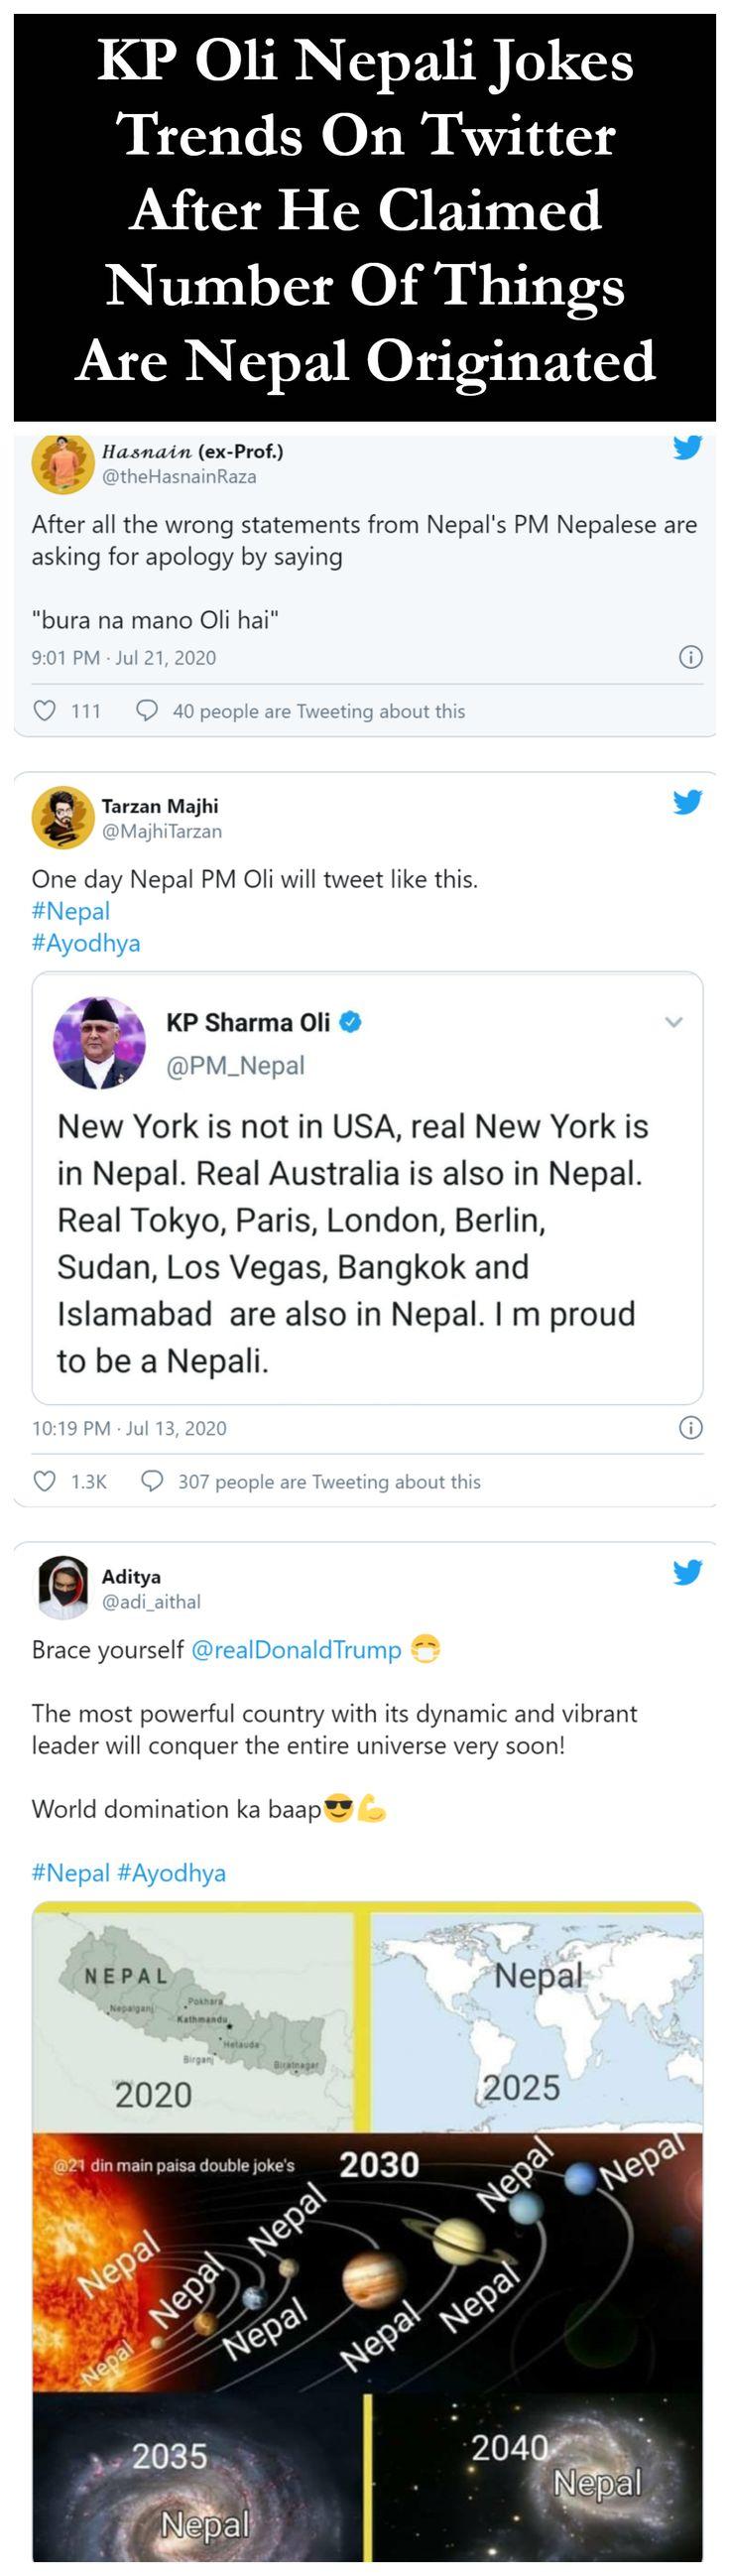 Kp Oli Nepali Jokes Trends On Twitter After He Claimed Number Of Things Are Nepal Originated Twitter Trending Jokes Funny Memes